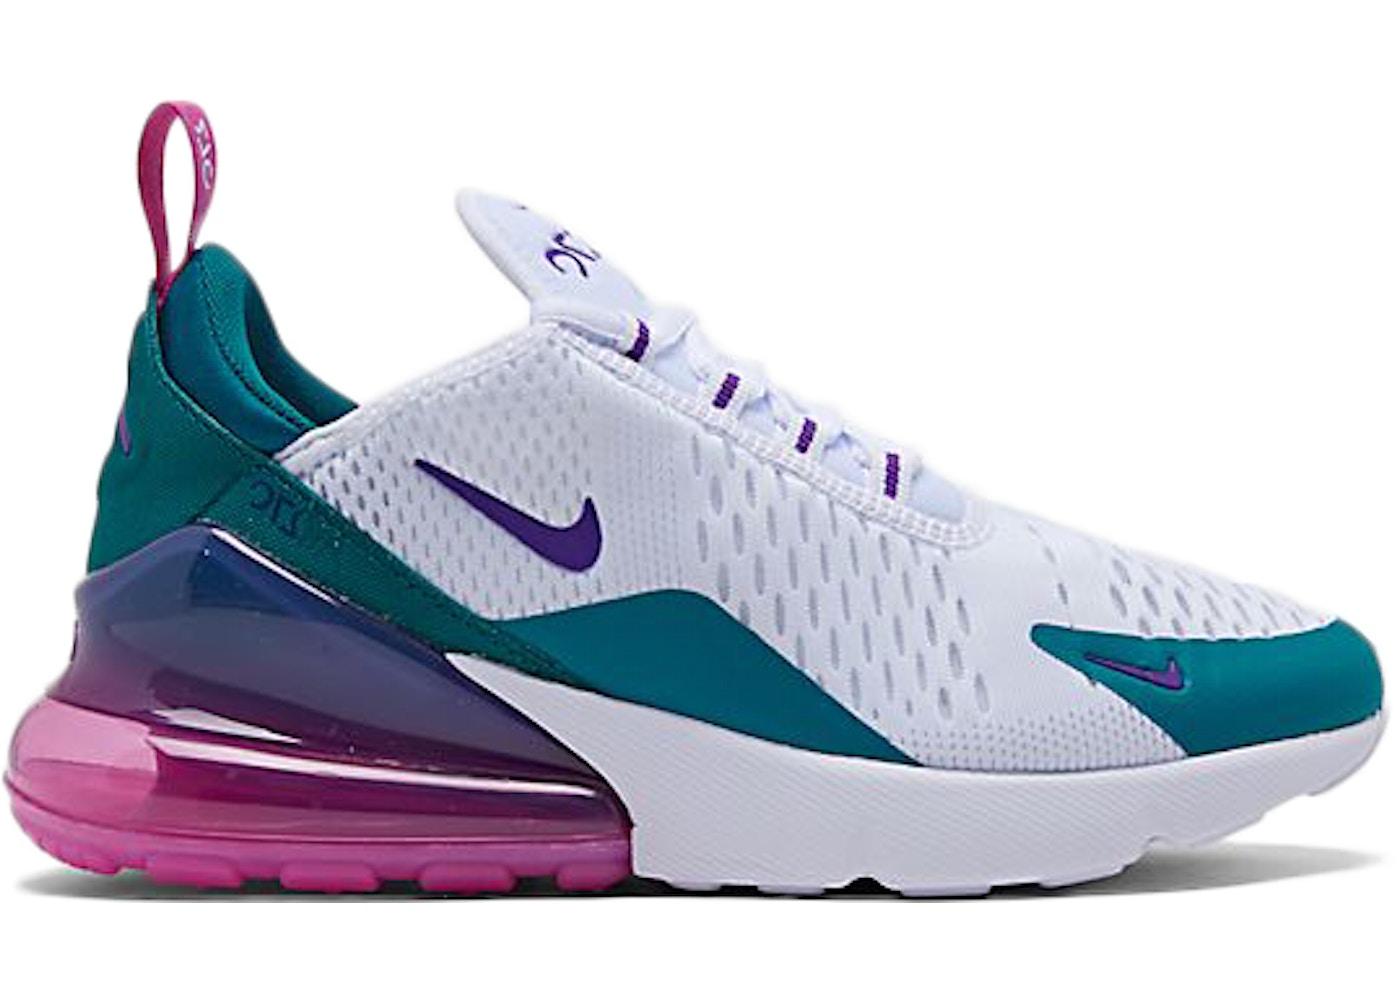 Nike Air Max 270 Bright Spruce Purple (W)